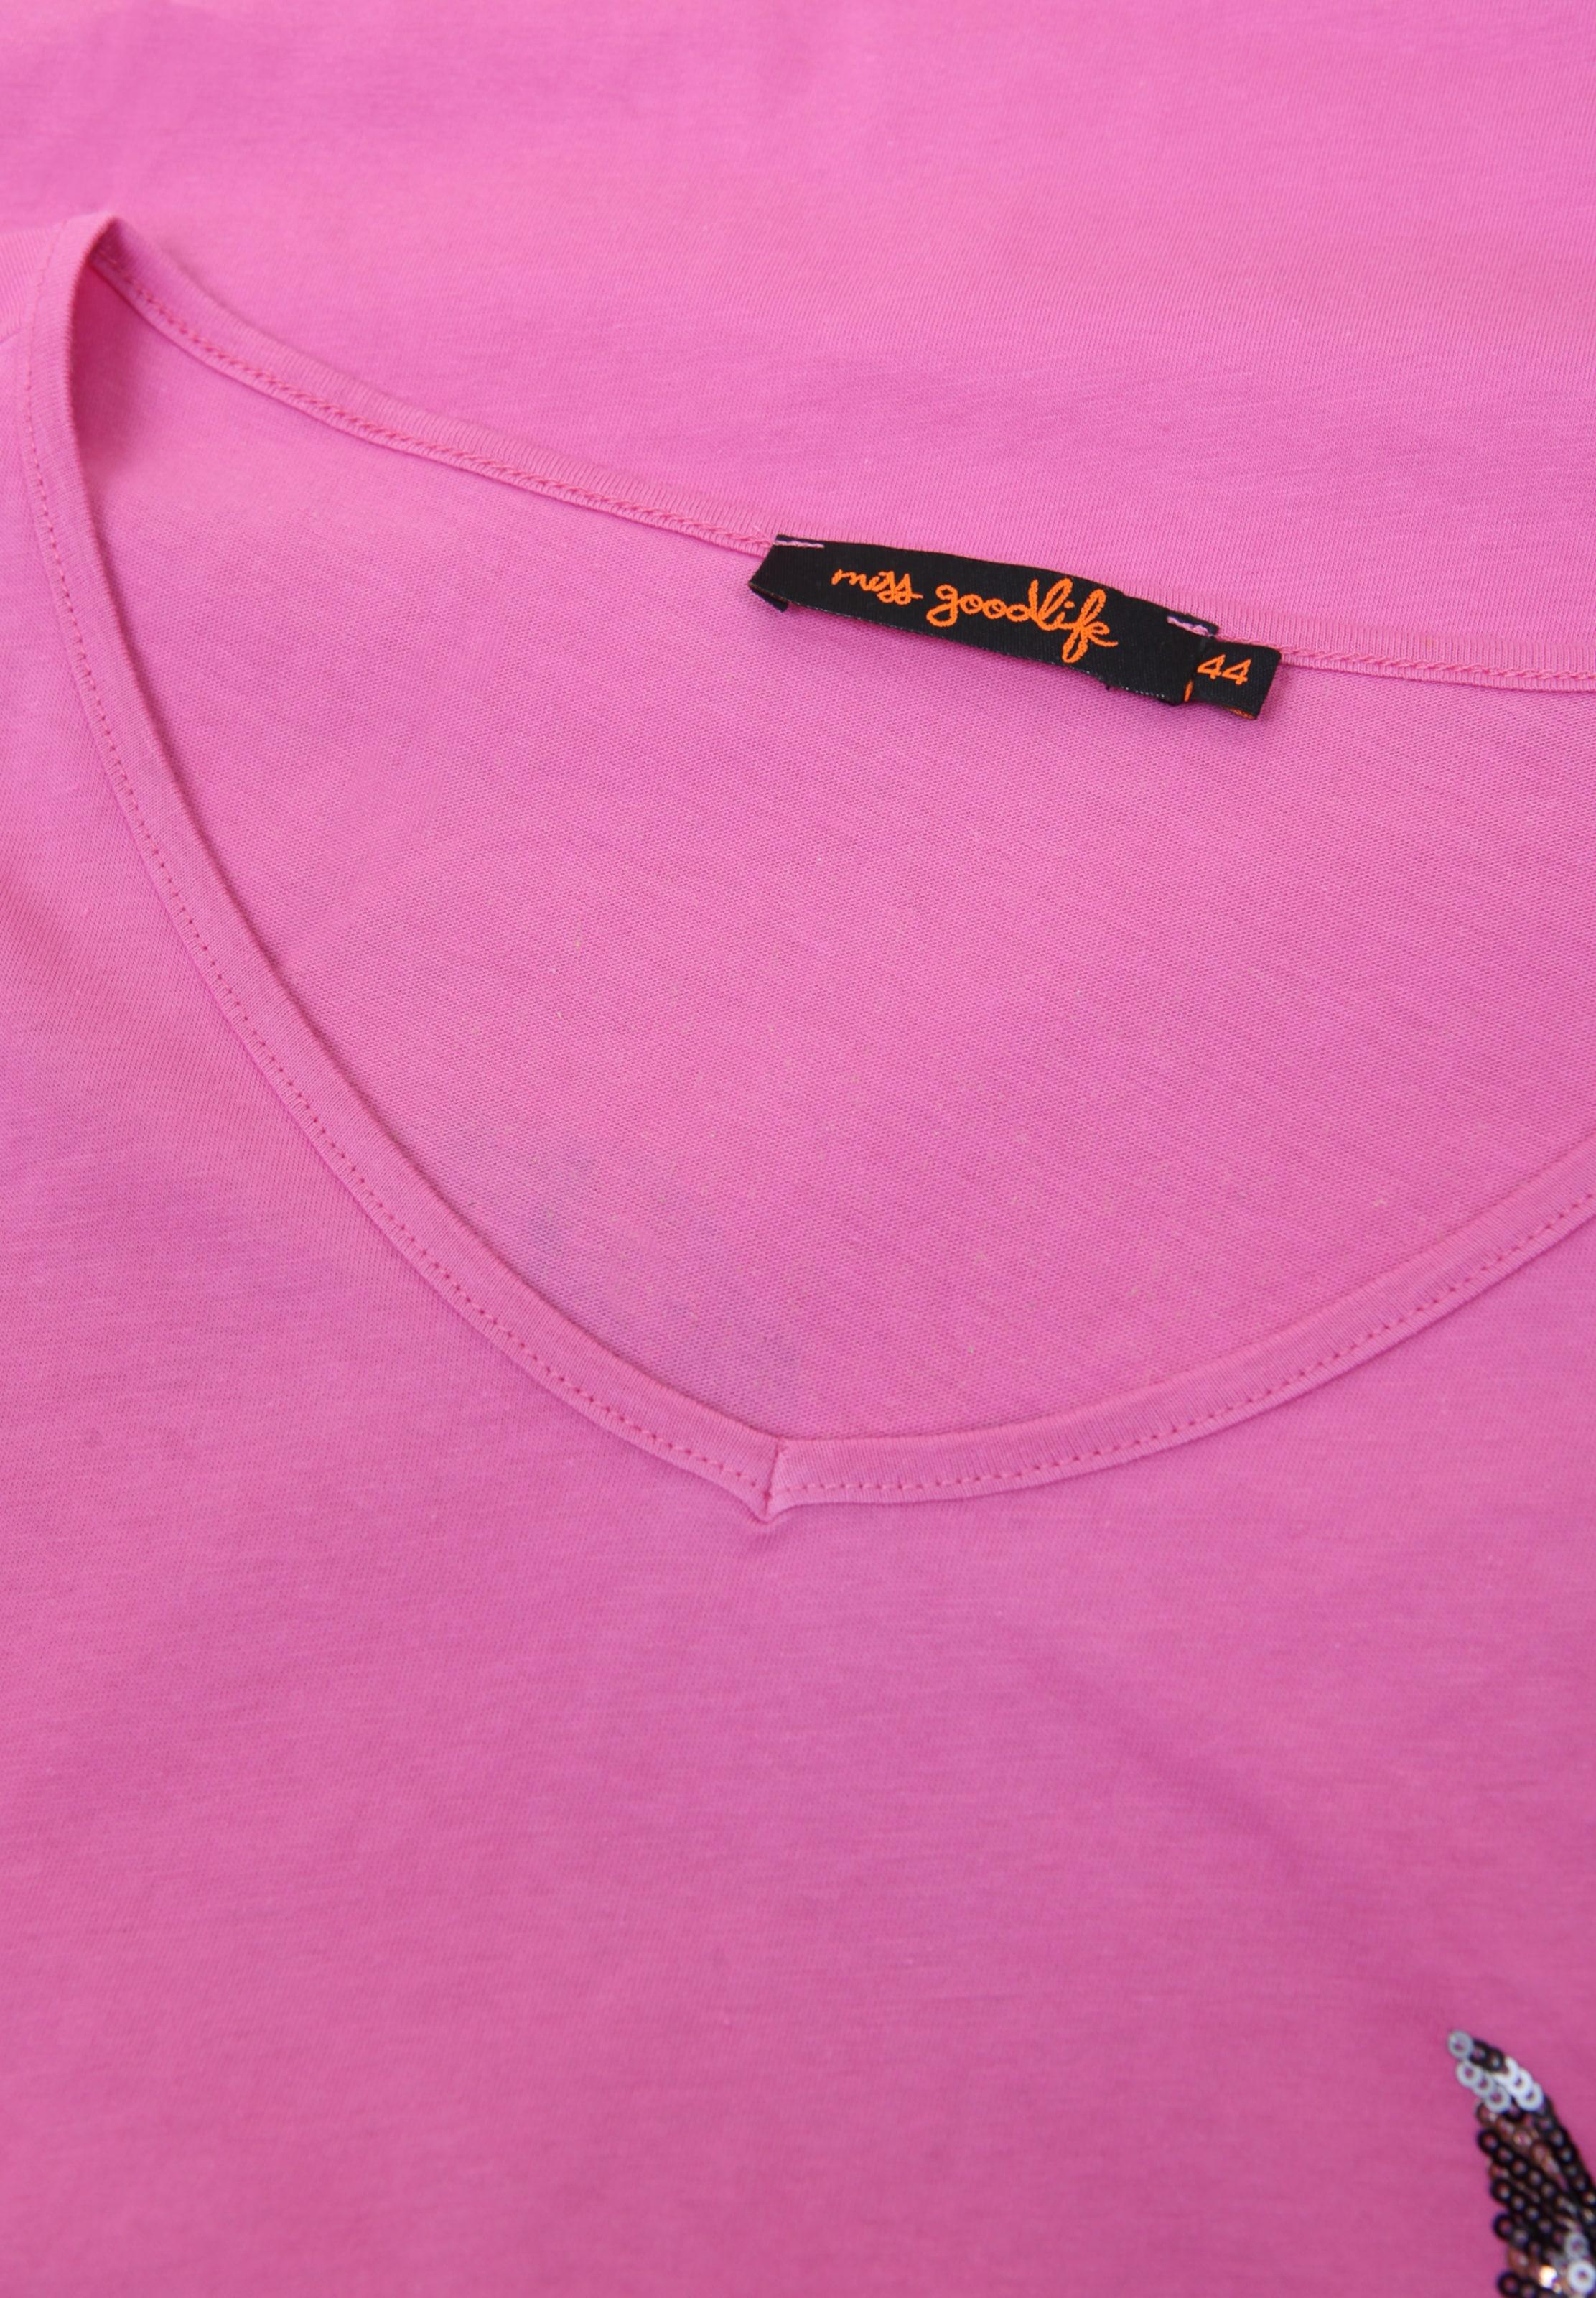 Goodlife In MischfarbenPink shirt Miss T D2IWYH9E